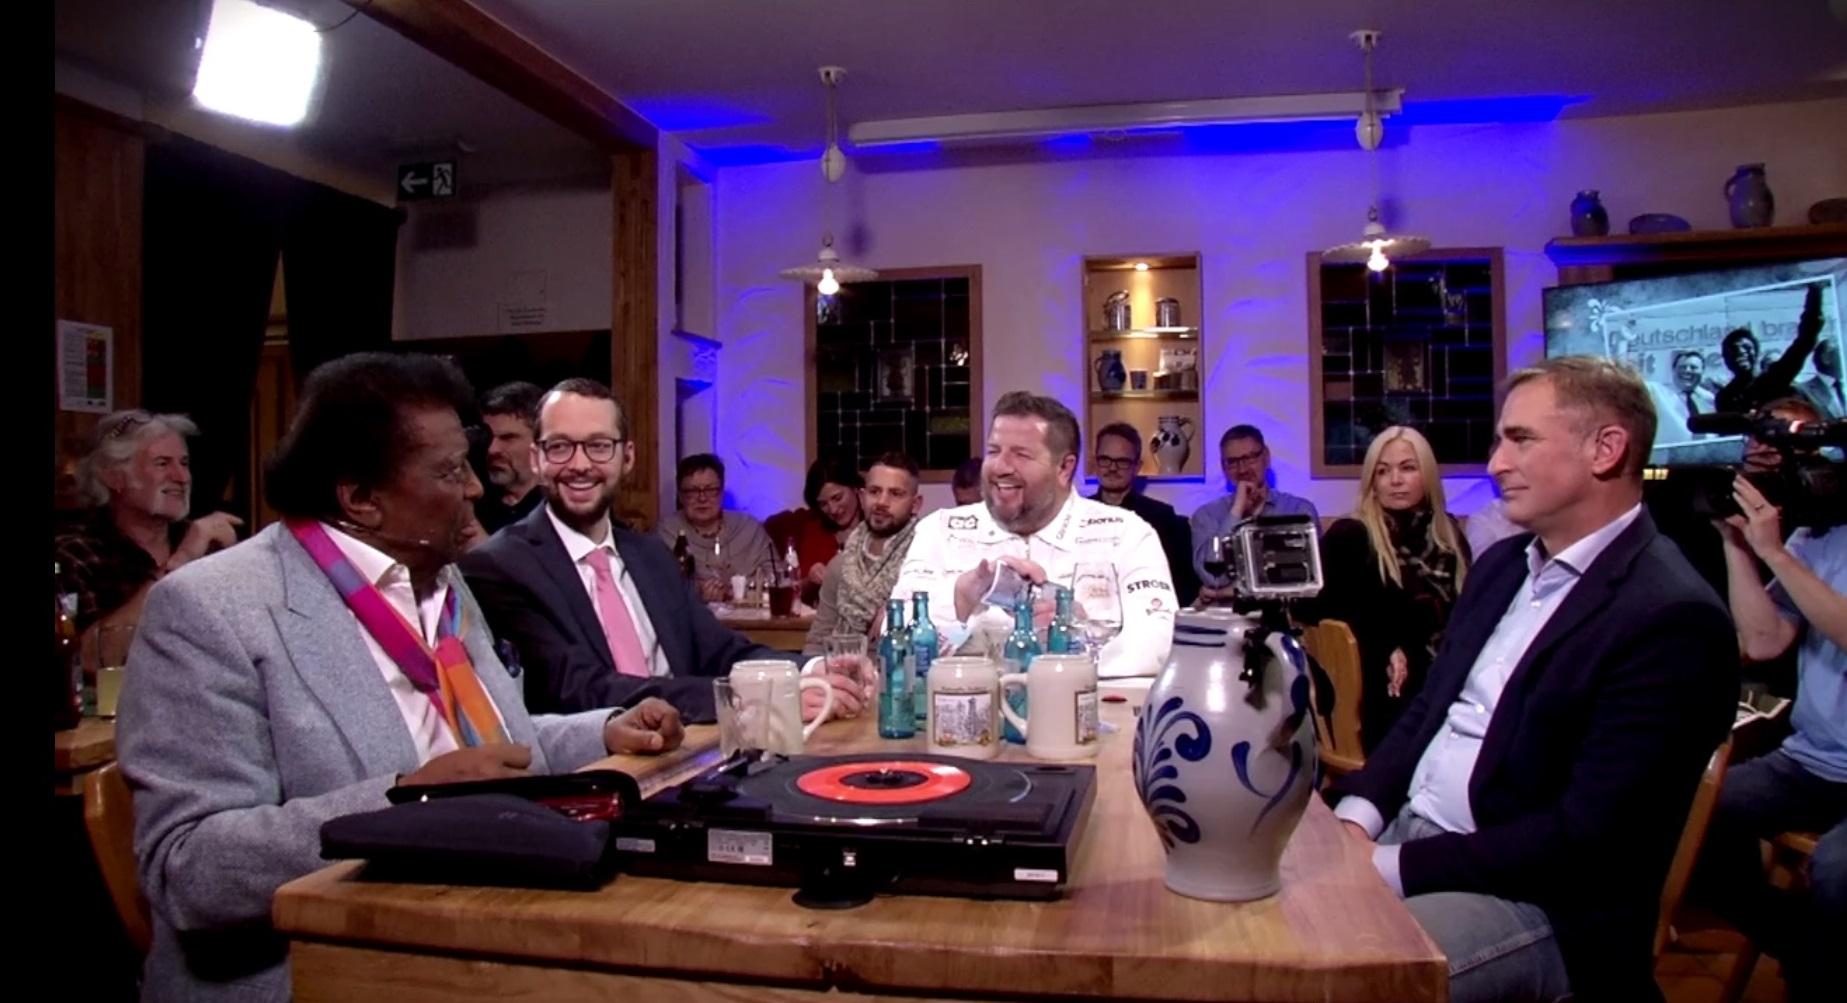 Bembel & Gebabbel – Folge 30 mit Roberto Blanco, Jan Schneider & Stefan Kuntzb